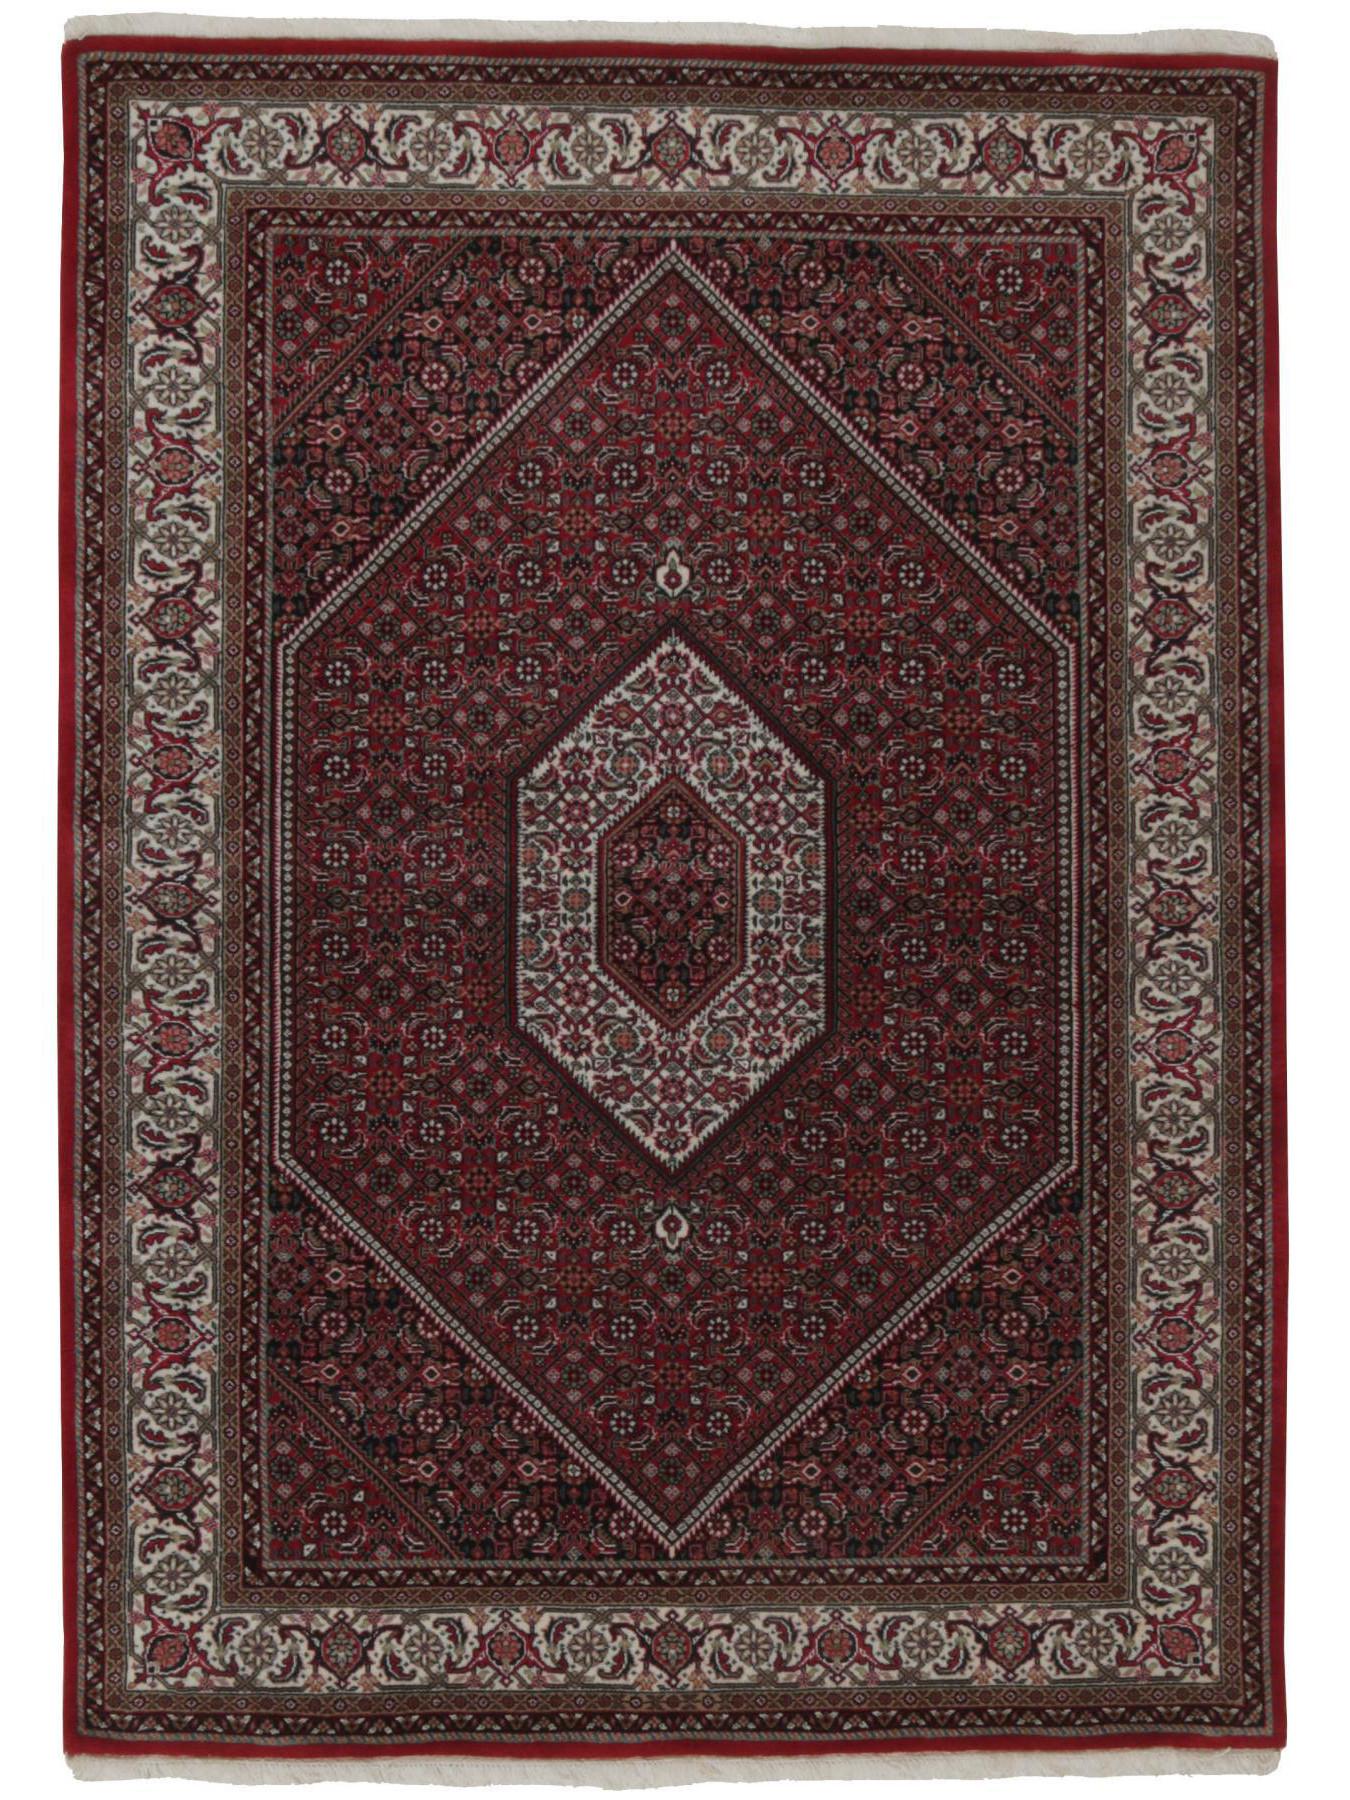 Classic rugs - Bidjar Indi Royal